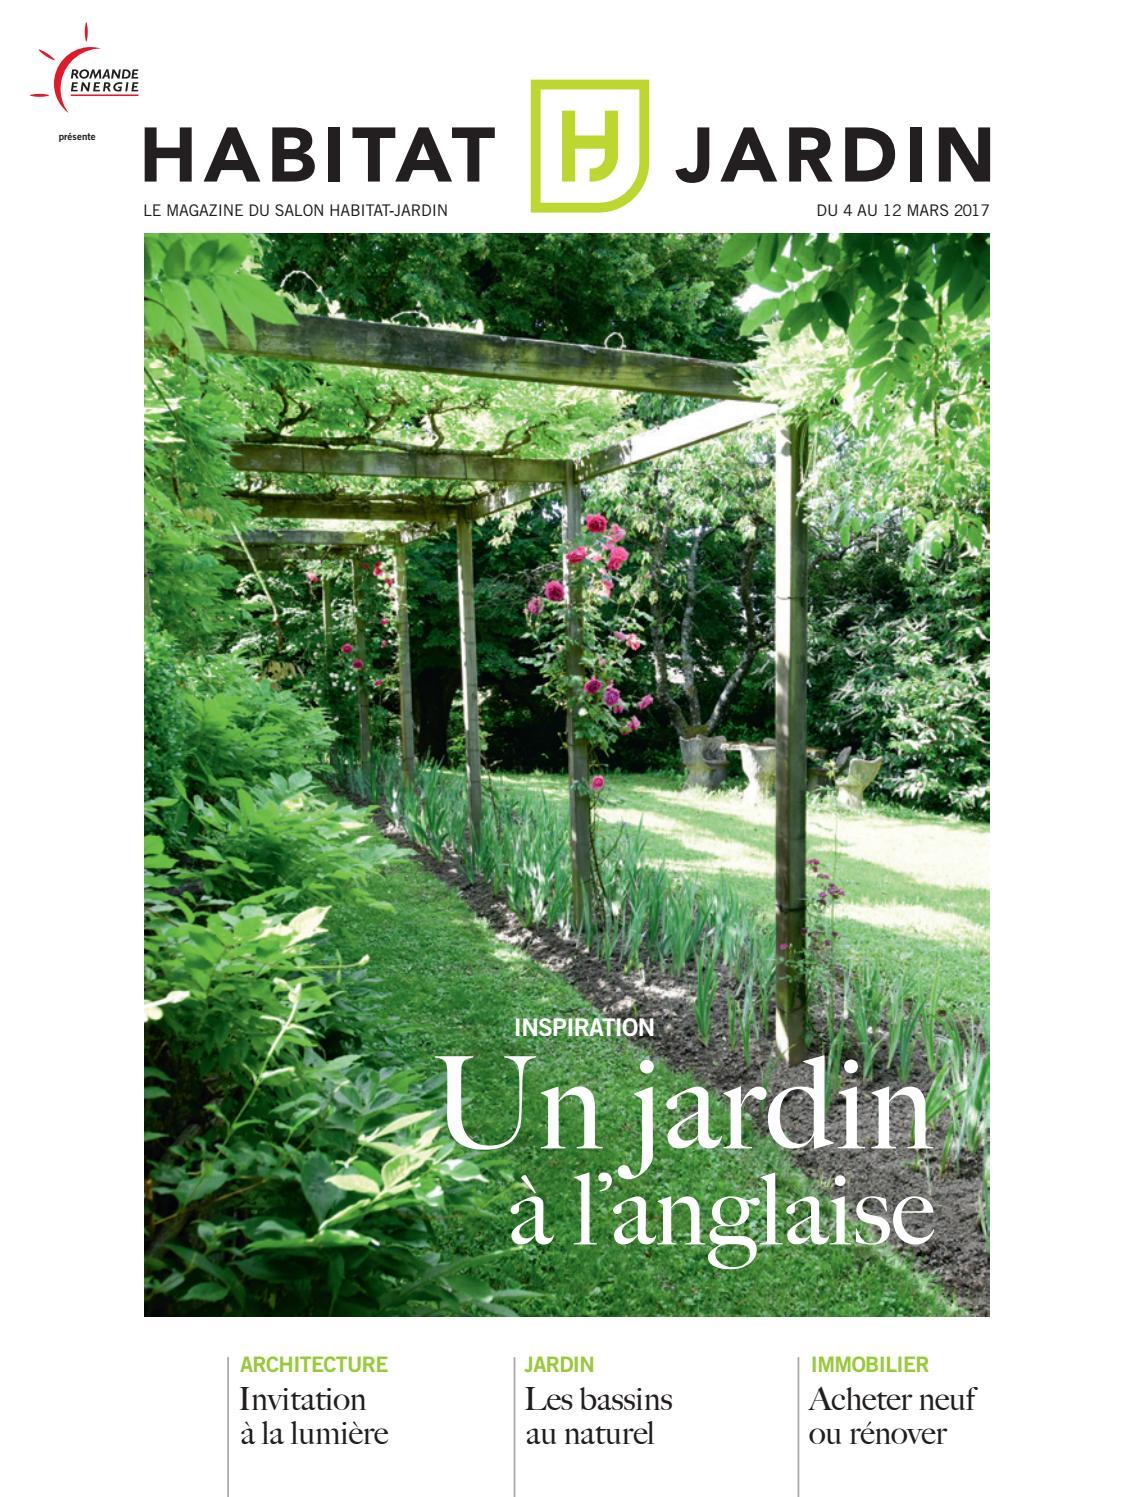 Habitat jardin 2017 by in dit publications sa issuu for Jardin habitat 2016